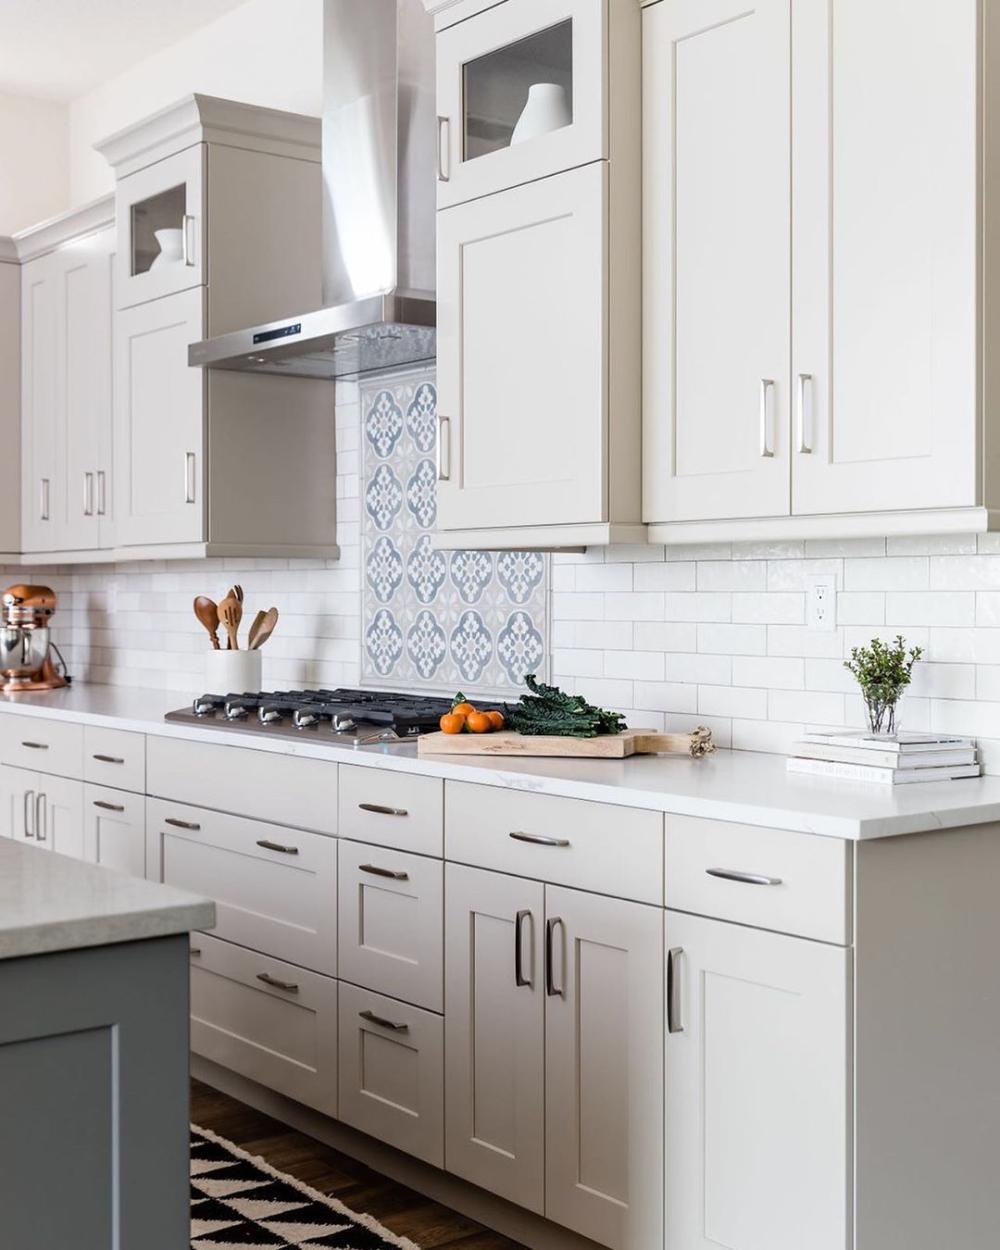 Crystal Cabinets Crystalcabinets Instagram Photos And Videos In 2020 Cabinetry Design Kitchen Design Beige Kitchen